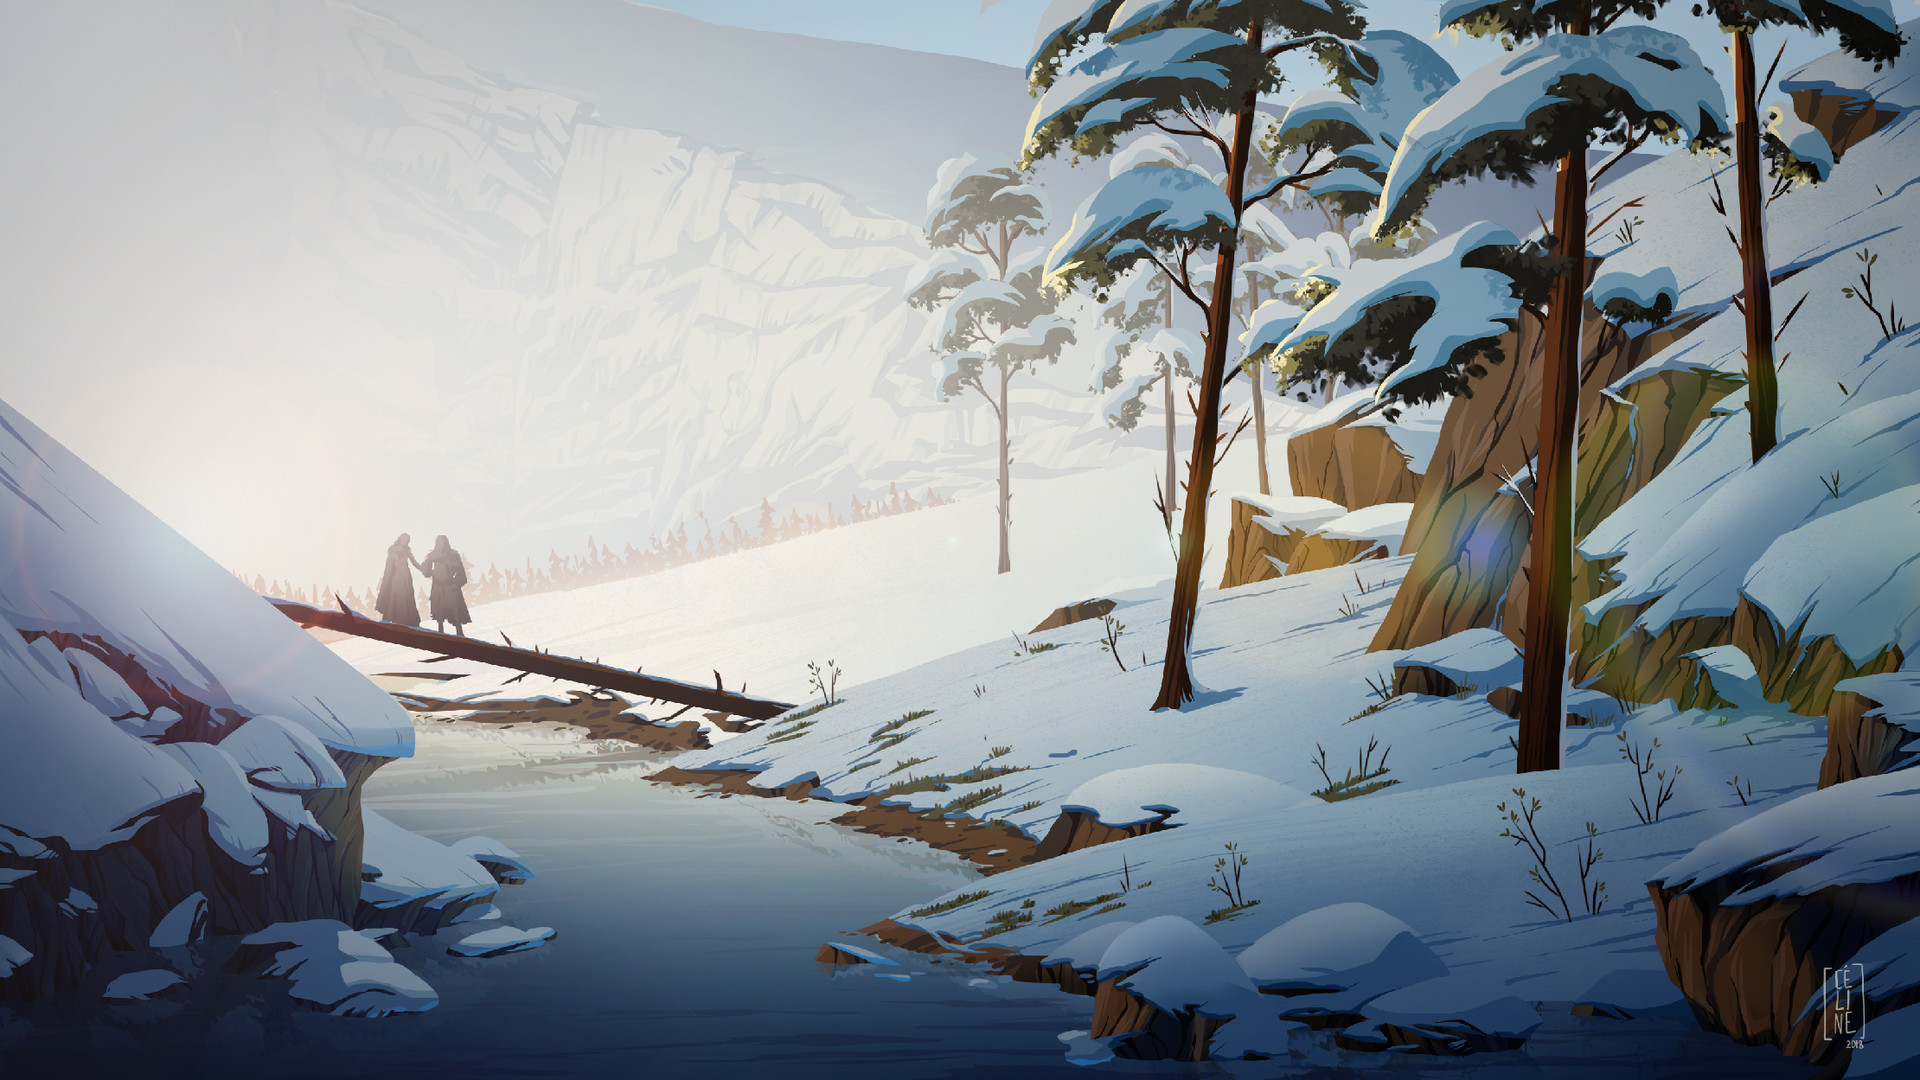 Celine Martin A Snowy Landscape